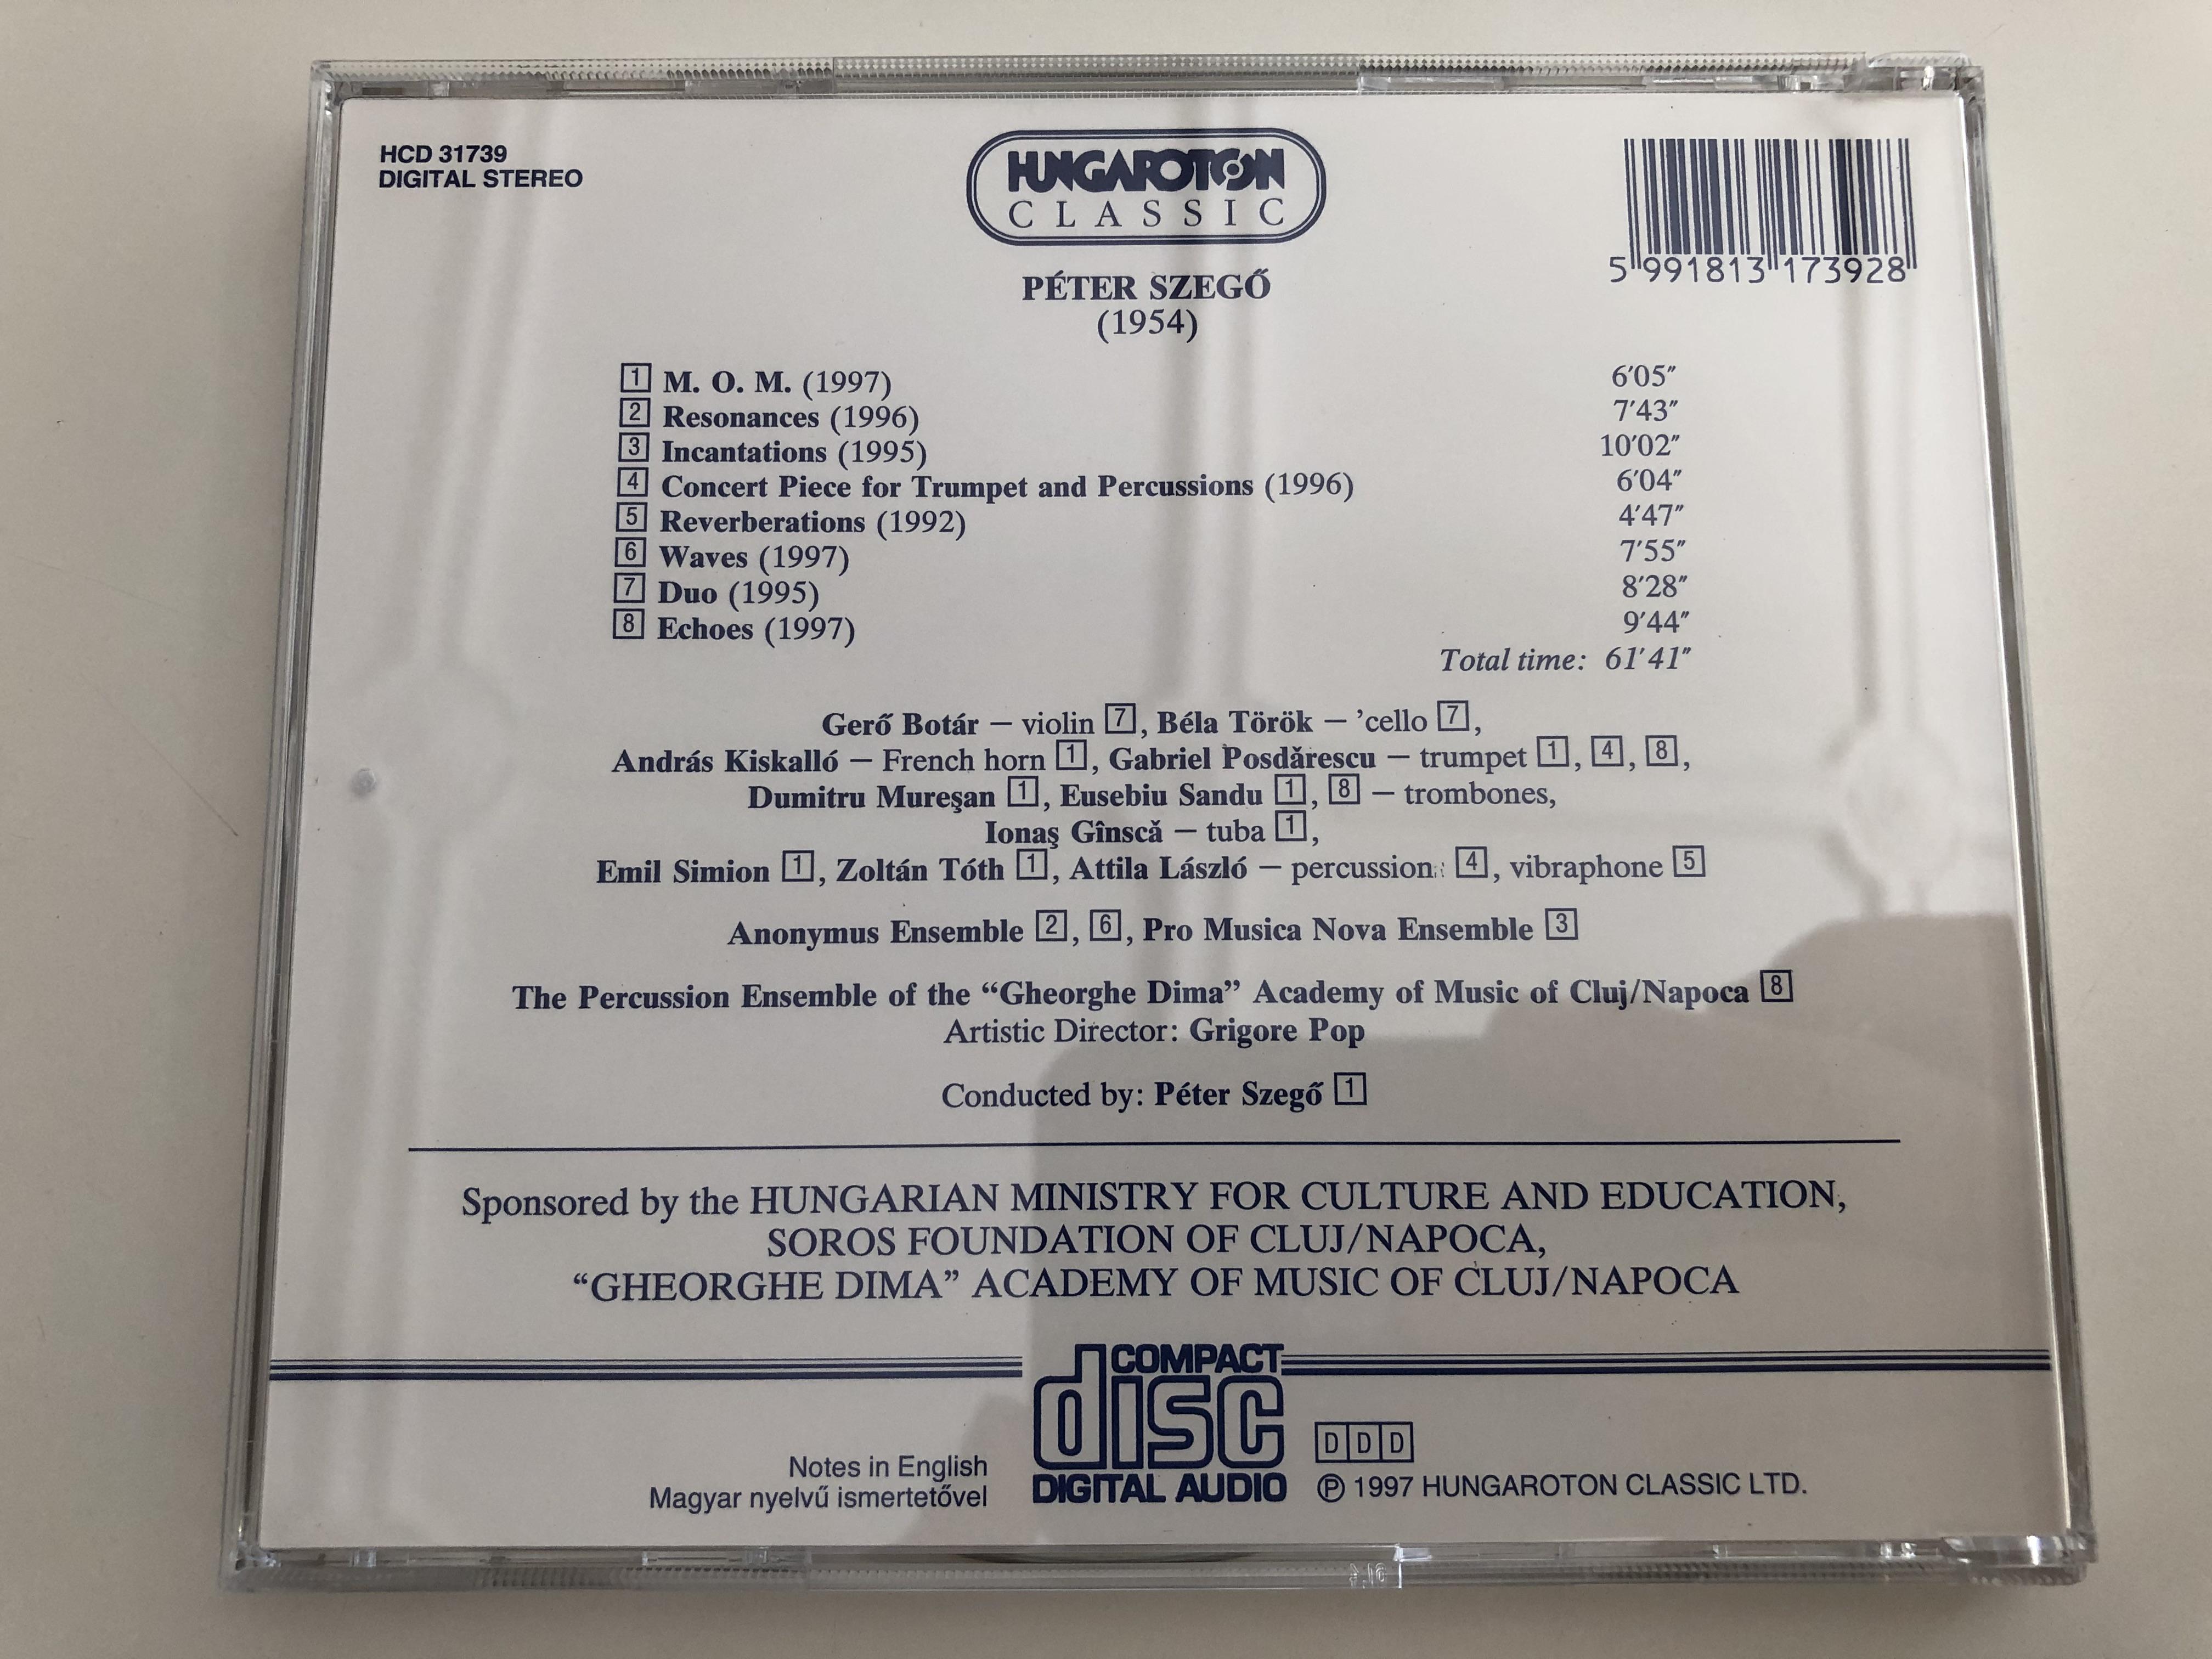 p-ter-szeg-m.o.m-romances-incantations-concert-piece-for-trumpet-and-percussion-reverberations-waves-duo-echoes-hungaroton-classic-audio-cd-1997-hcd-31739-8-.jpg